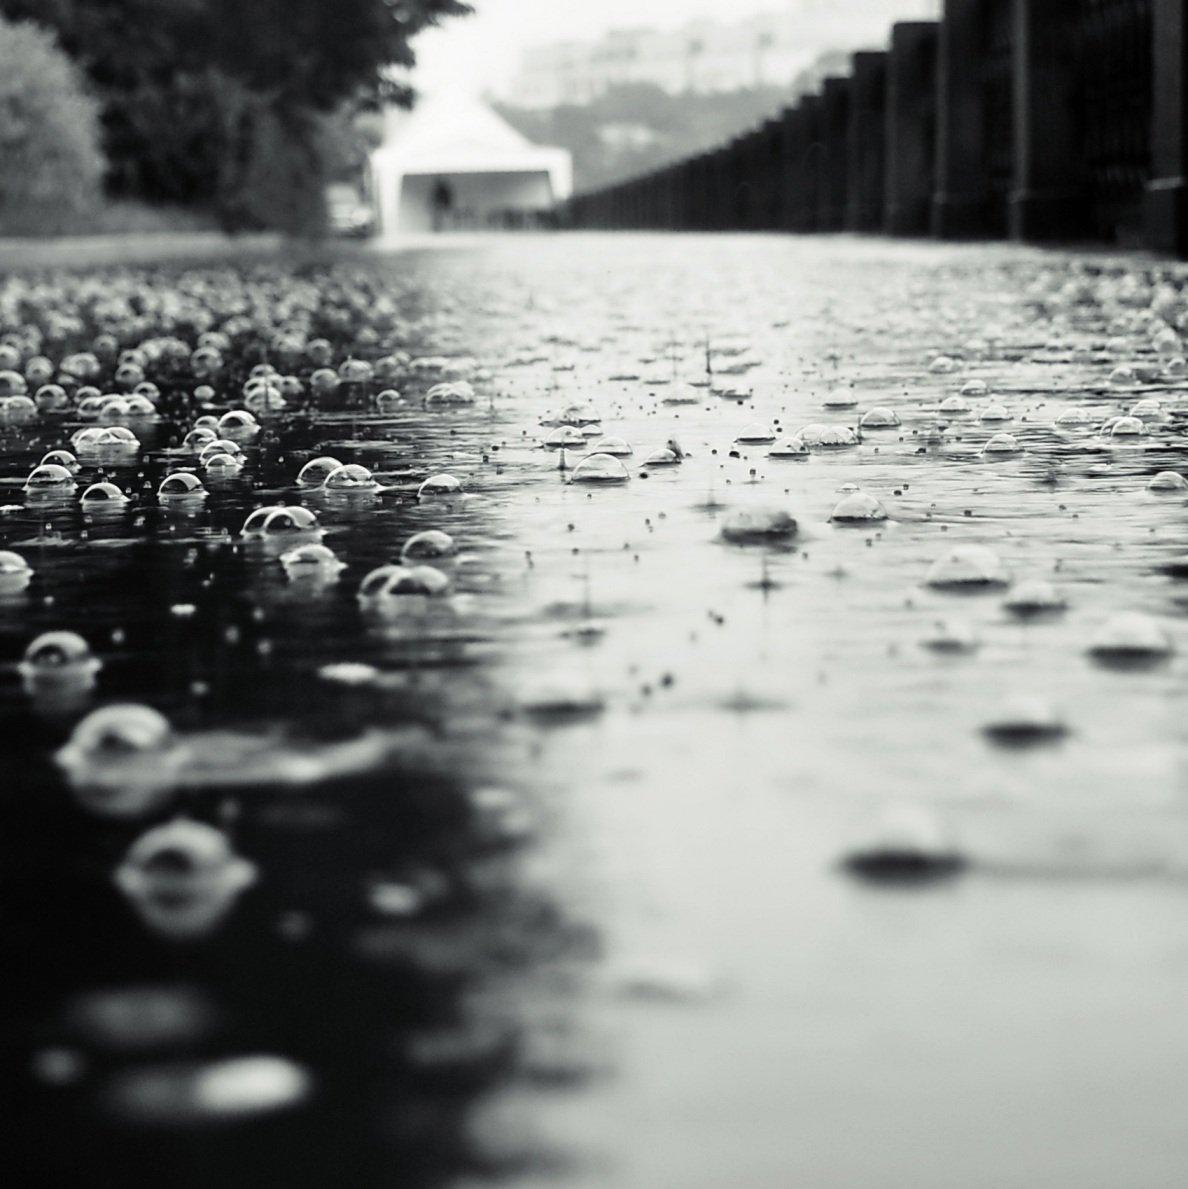 дождь, пузыри, капли, Ann